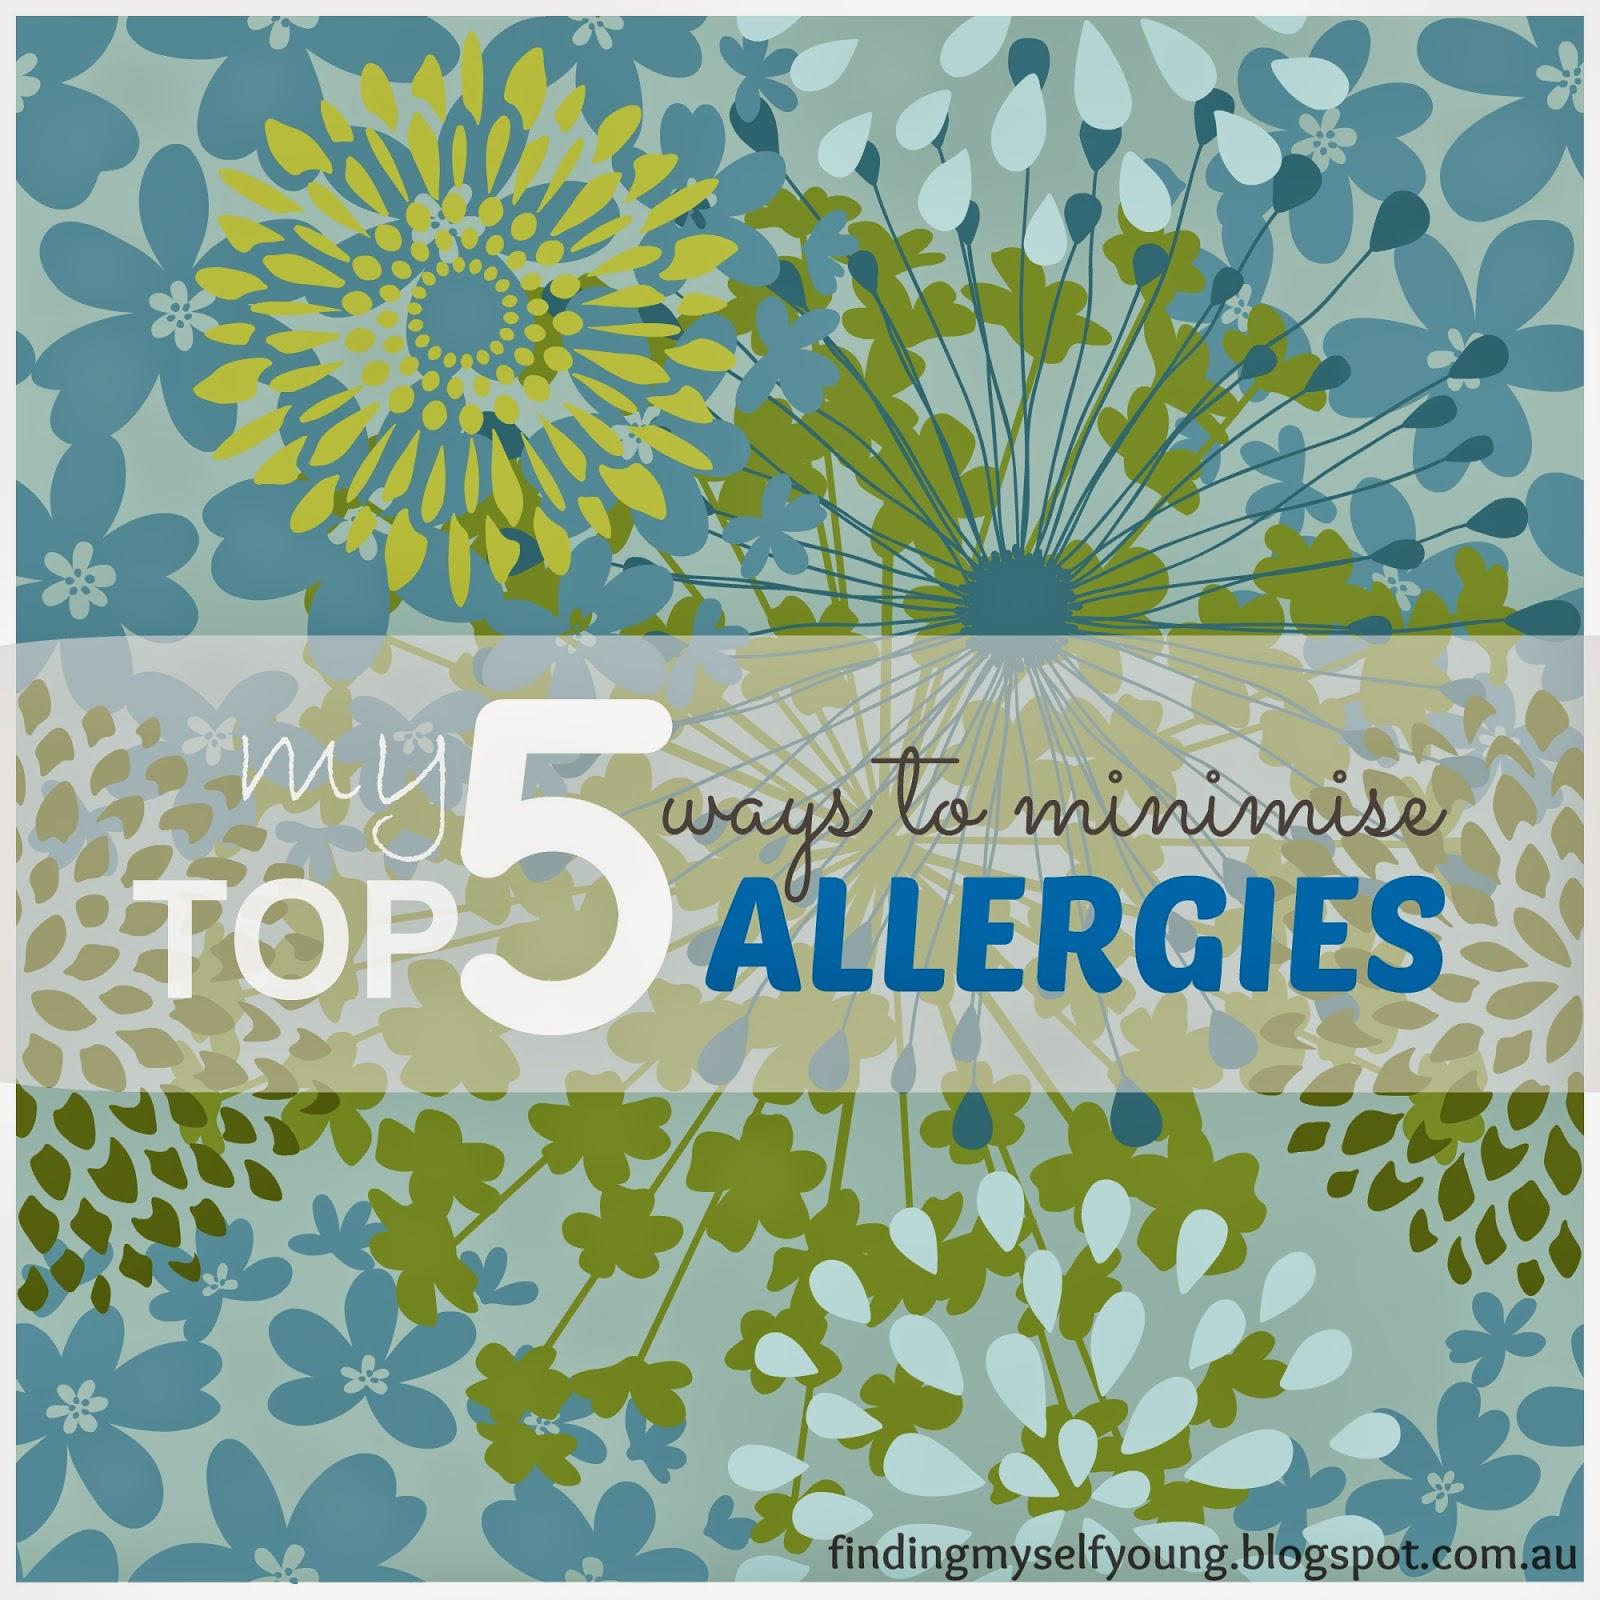 top five ways to minimise allergies